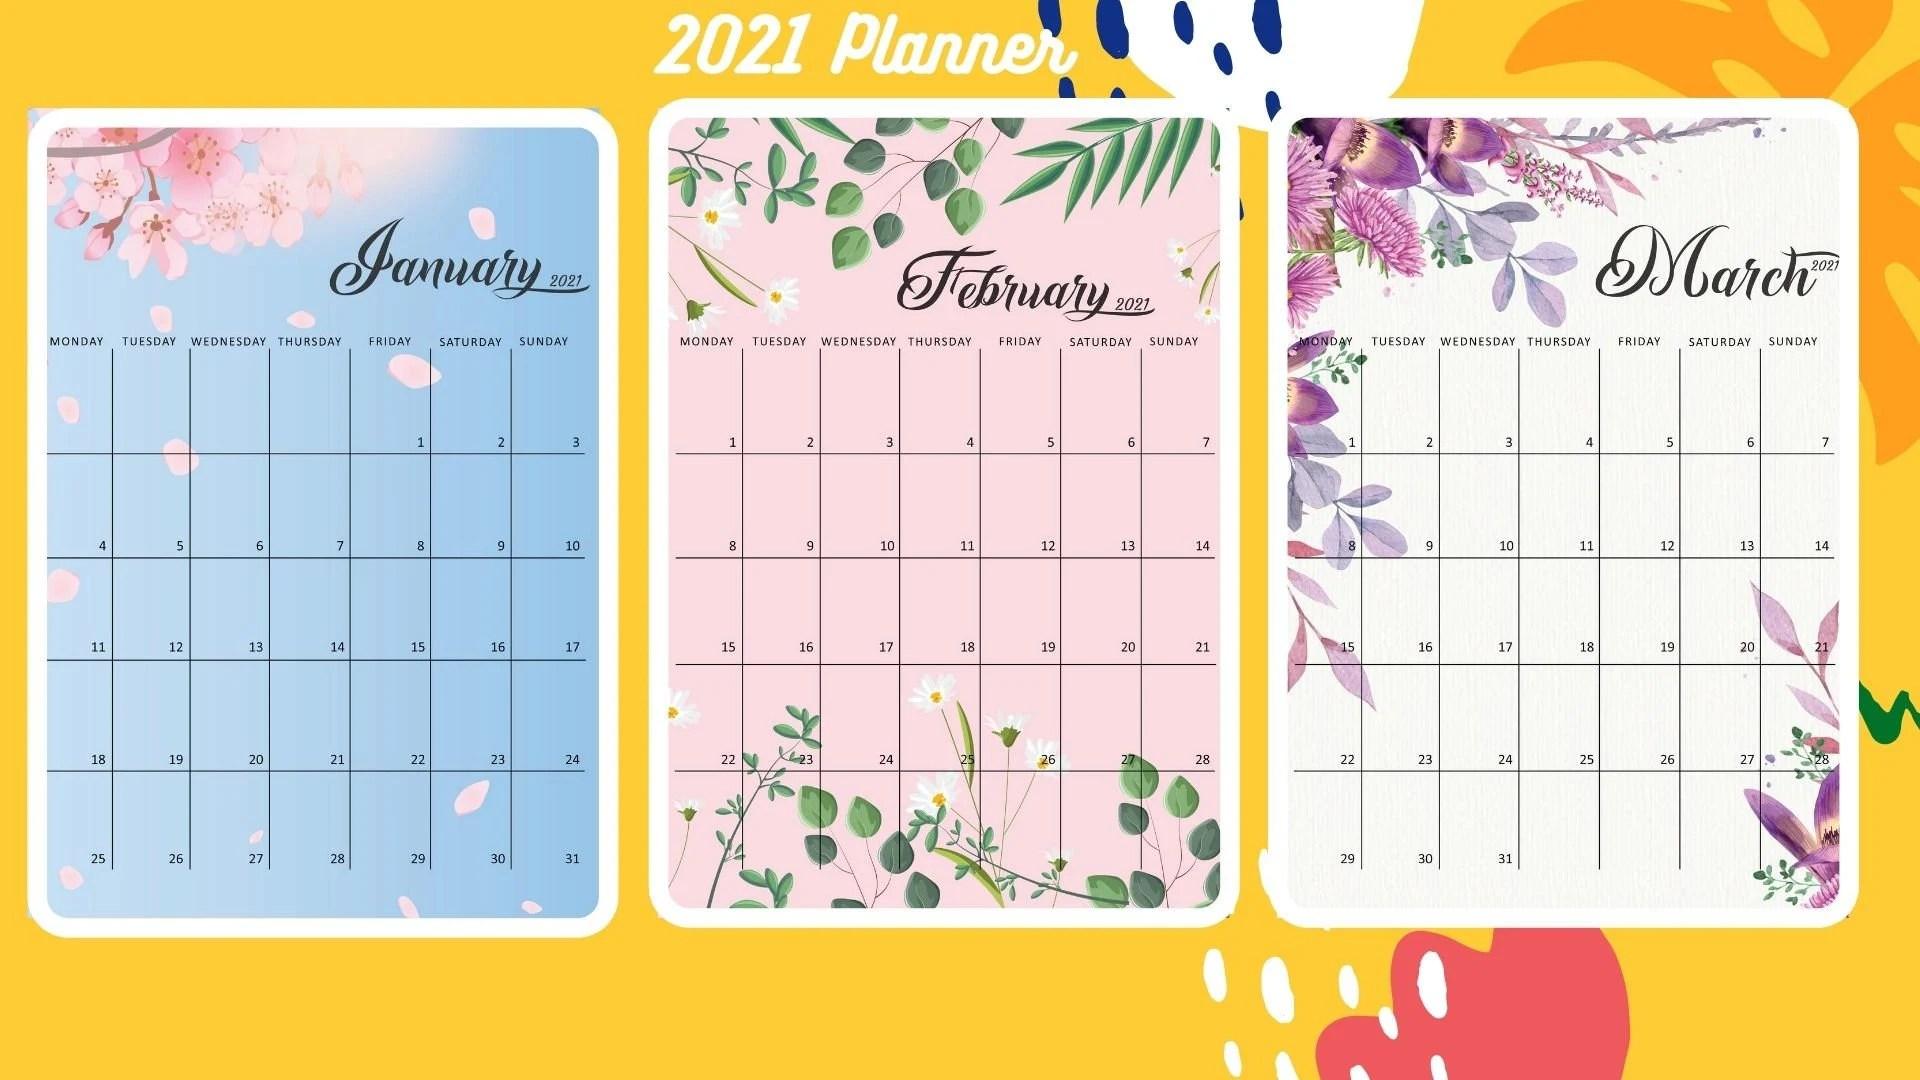 2021 blank monthly calendar pagespdf format. 2021 Calendar Printable 2021 Calendar Template Monthly   Etsy